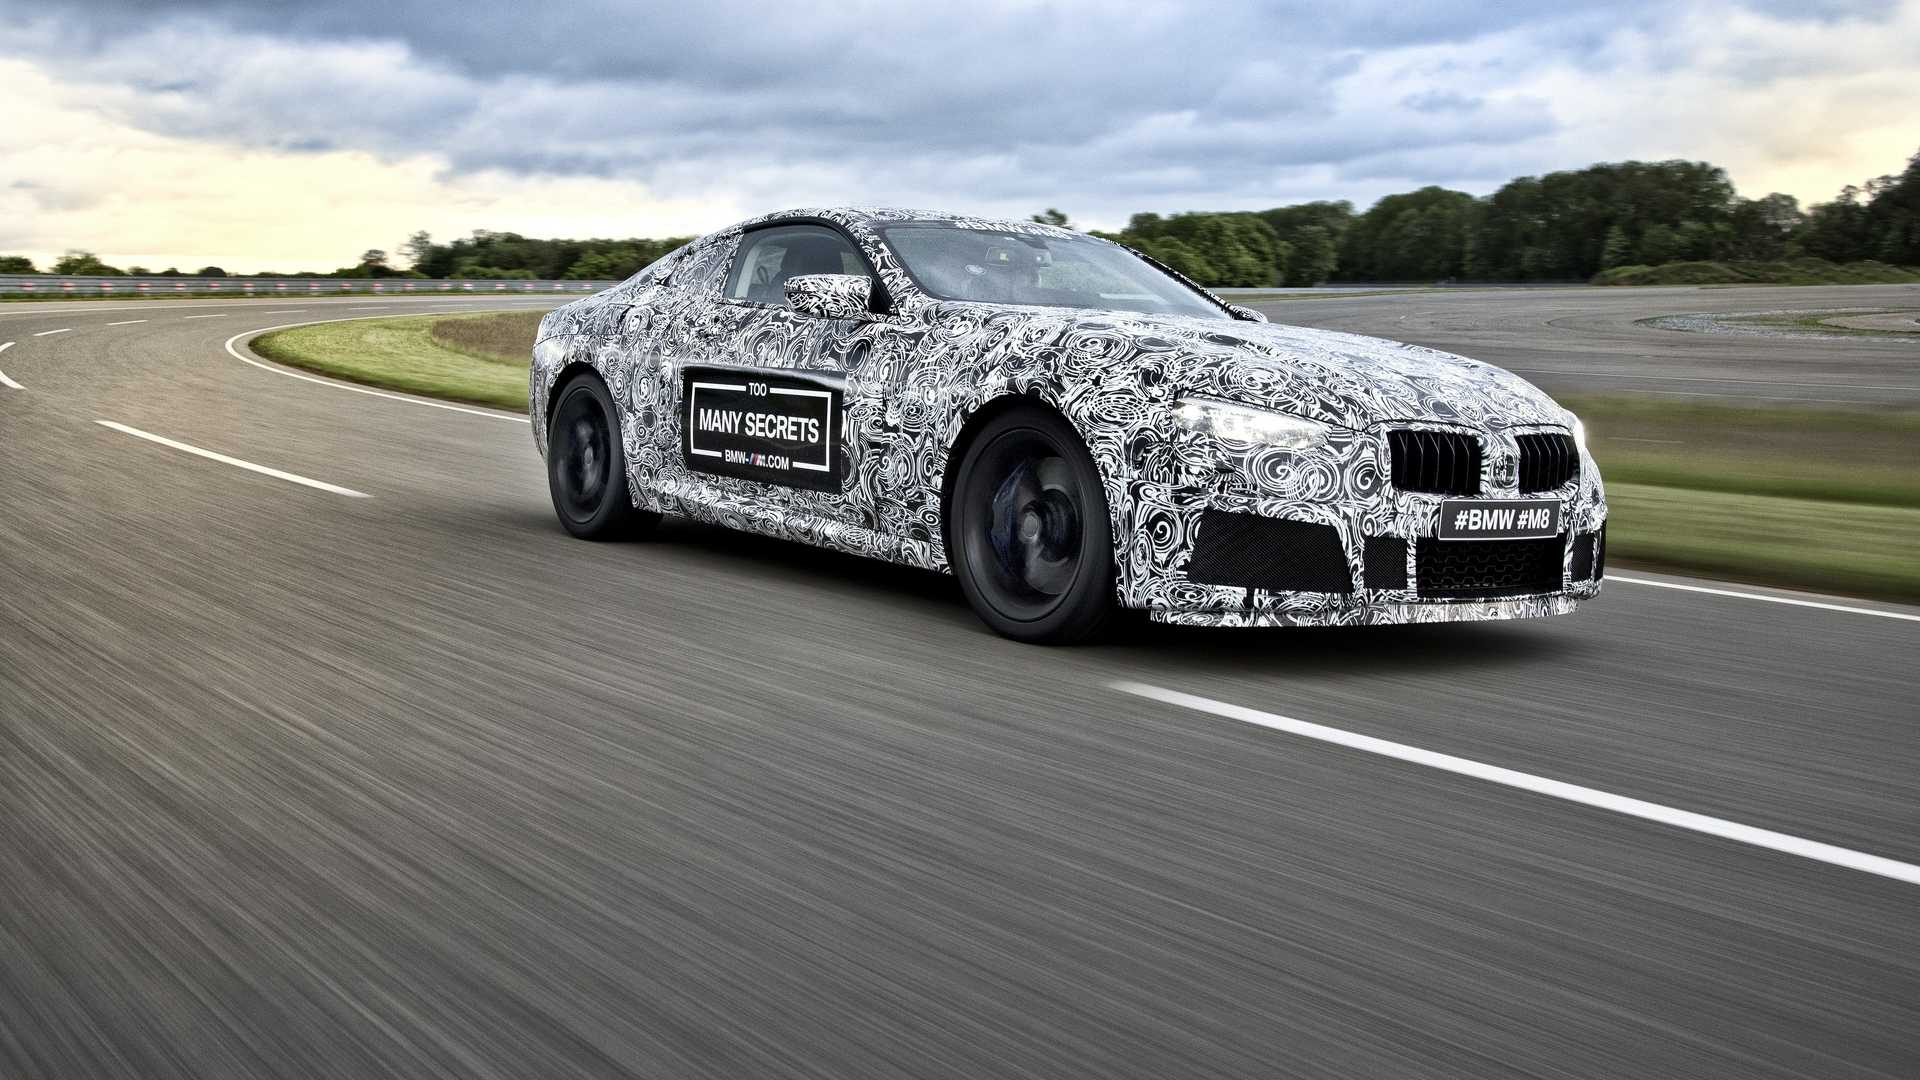 BMW M8 i BMW M8 GTE (galerija)